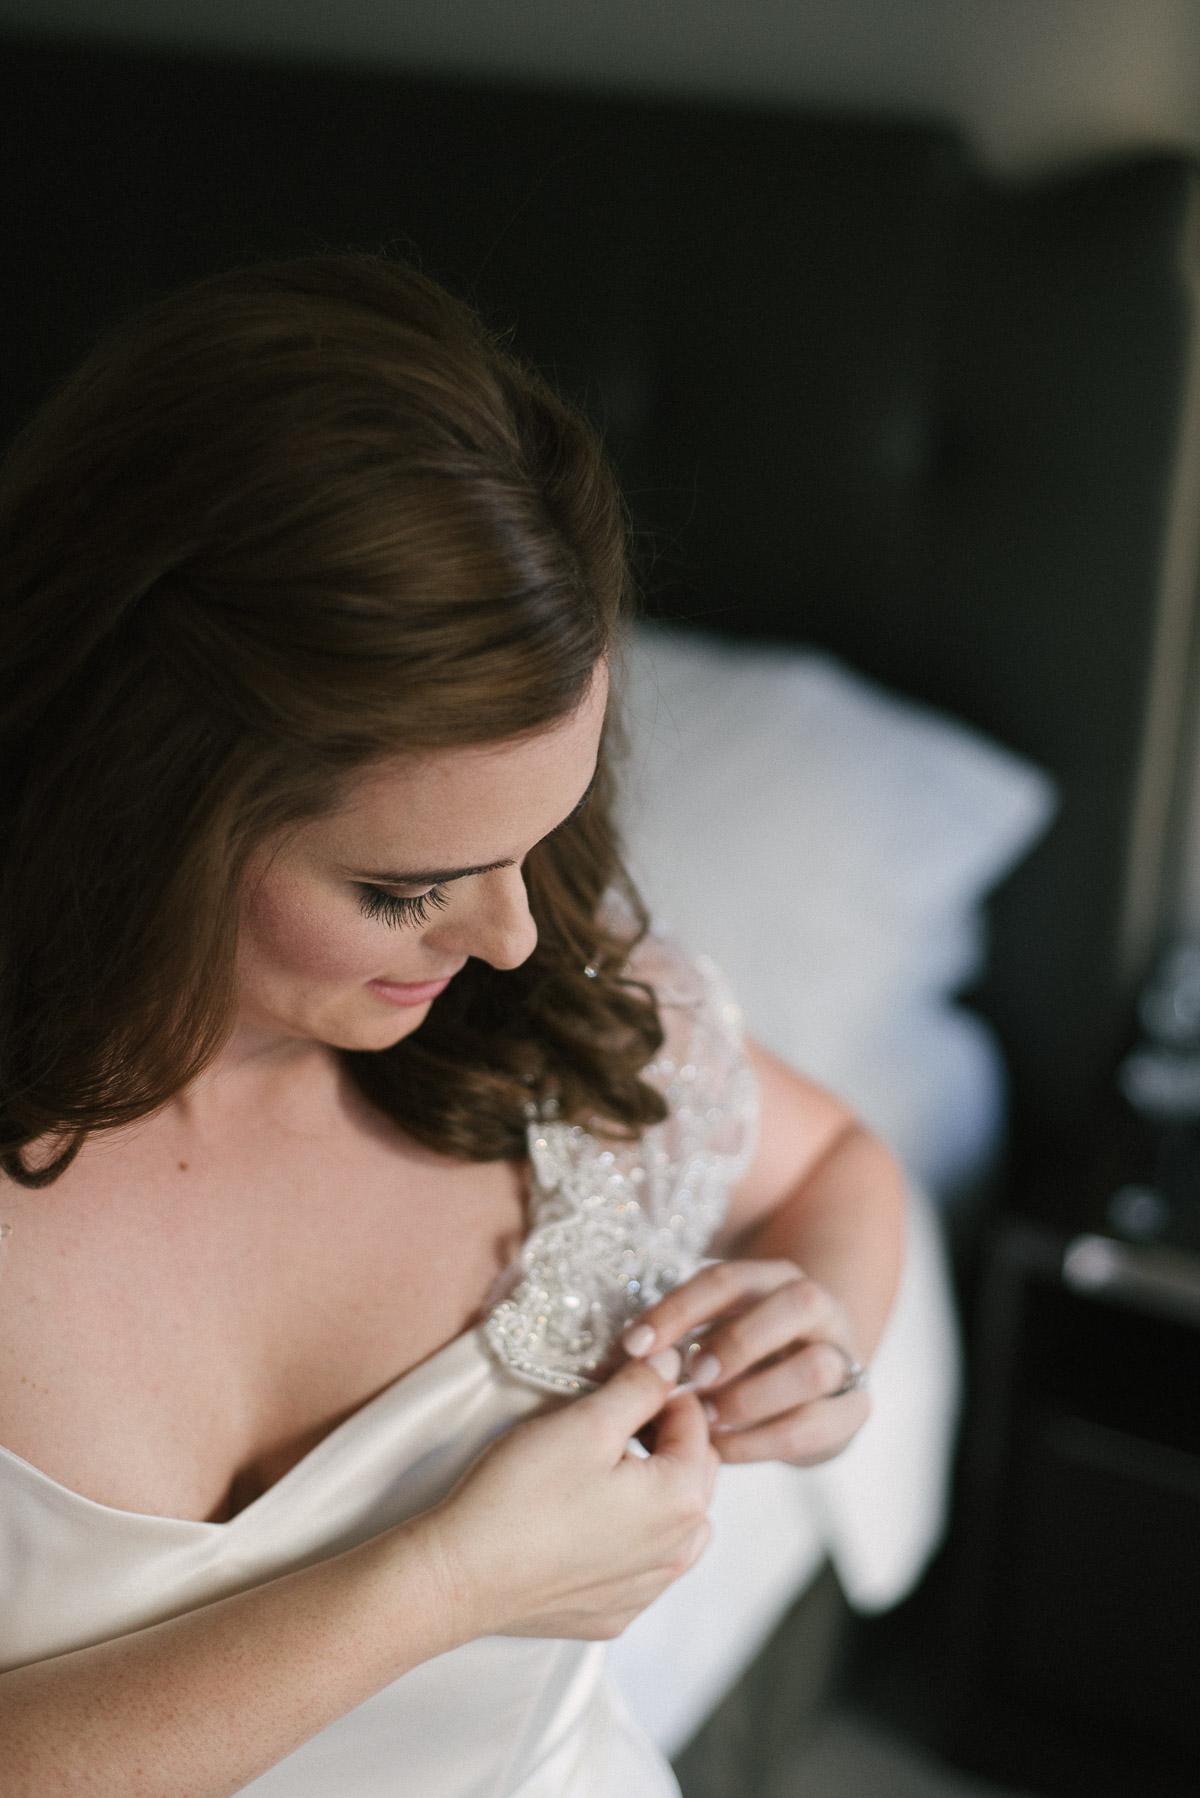 Pamela Yasuko Photography - A New Leaf Wedding - Chicago Oahu Photographer-4.jpg